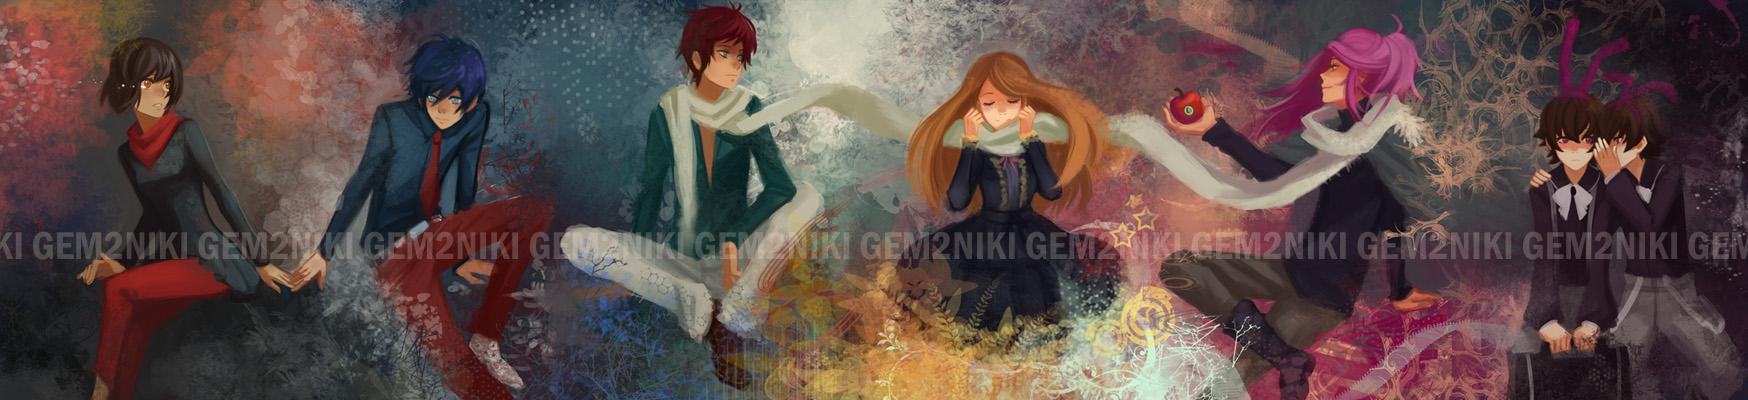 20111021 Penguindrum by gem2niki